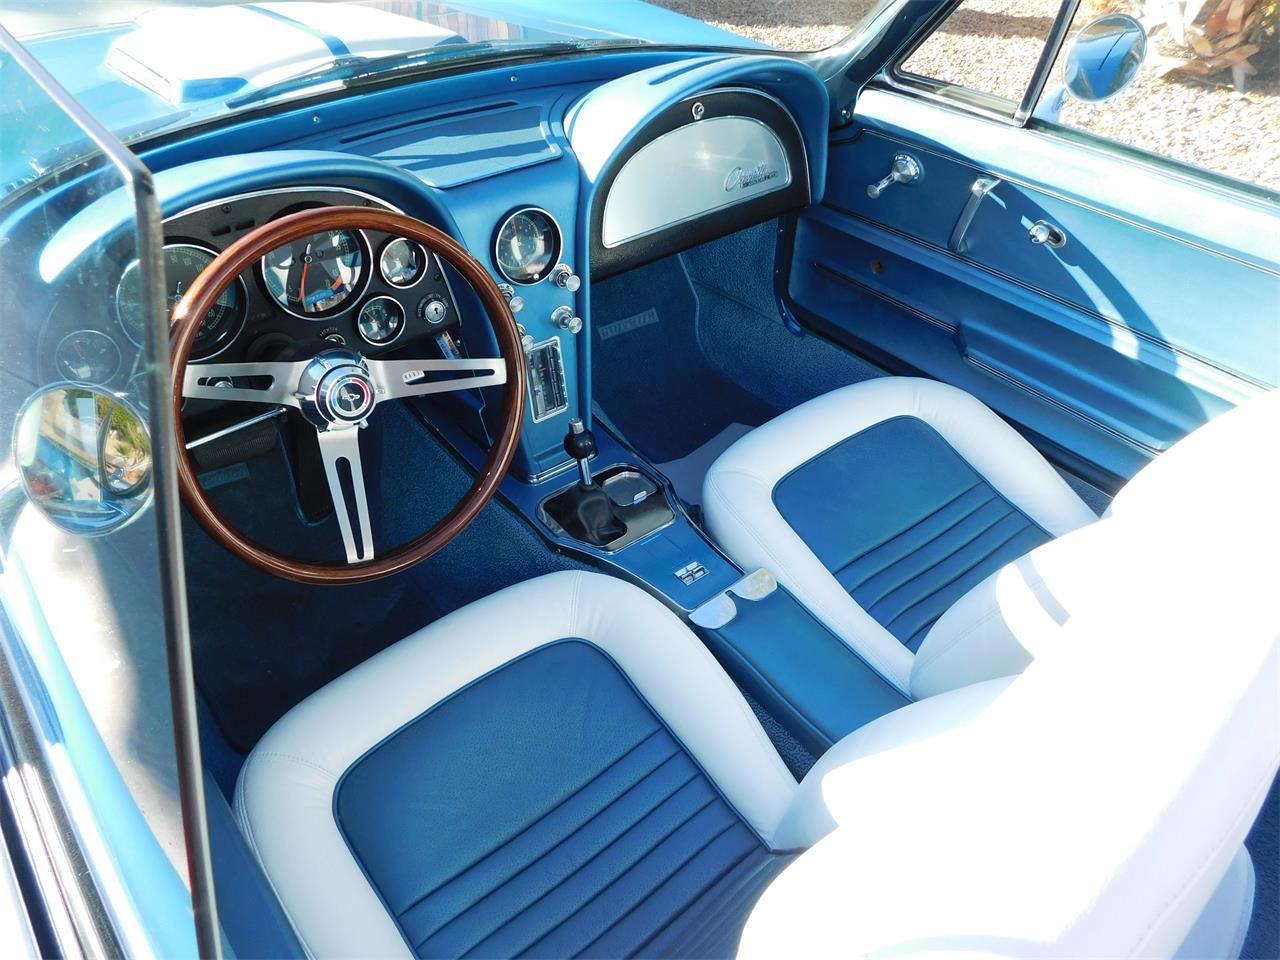 1965 Chevrolet Corvette (CC-1177546) for sale in Scottsdale, Arizona